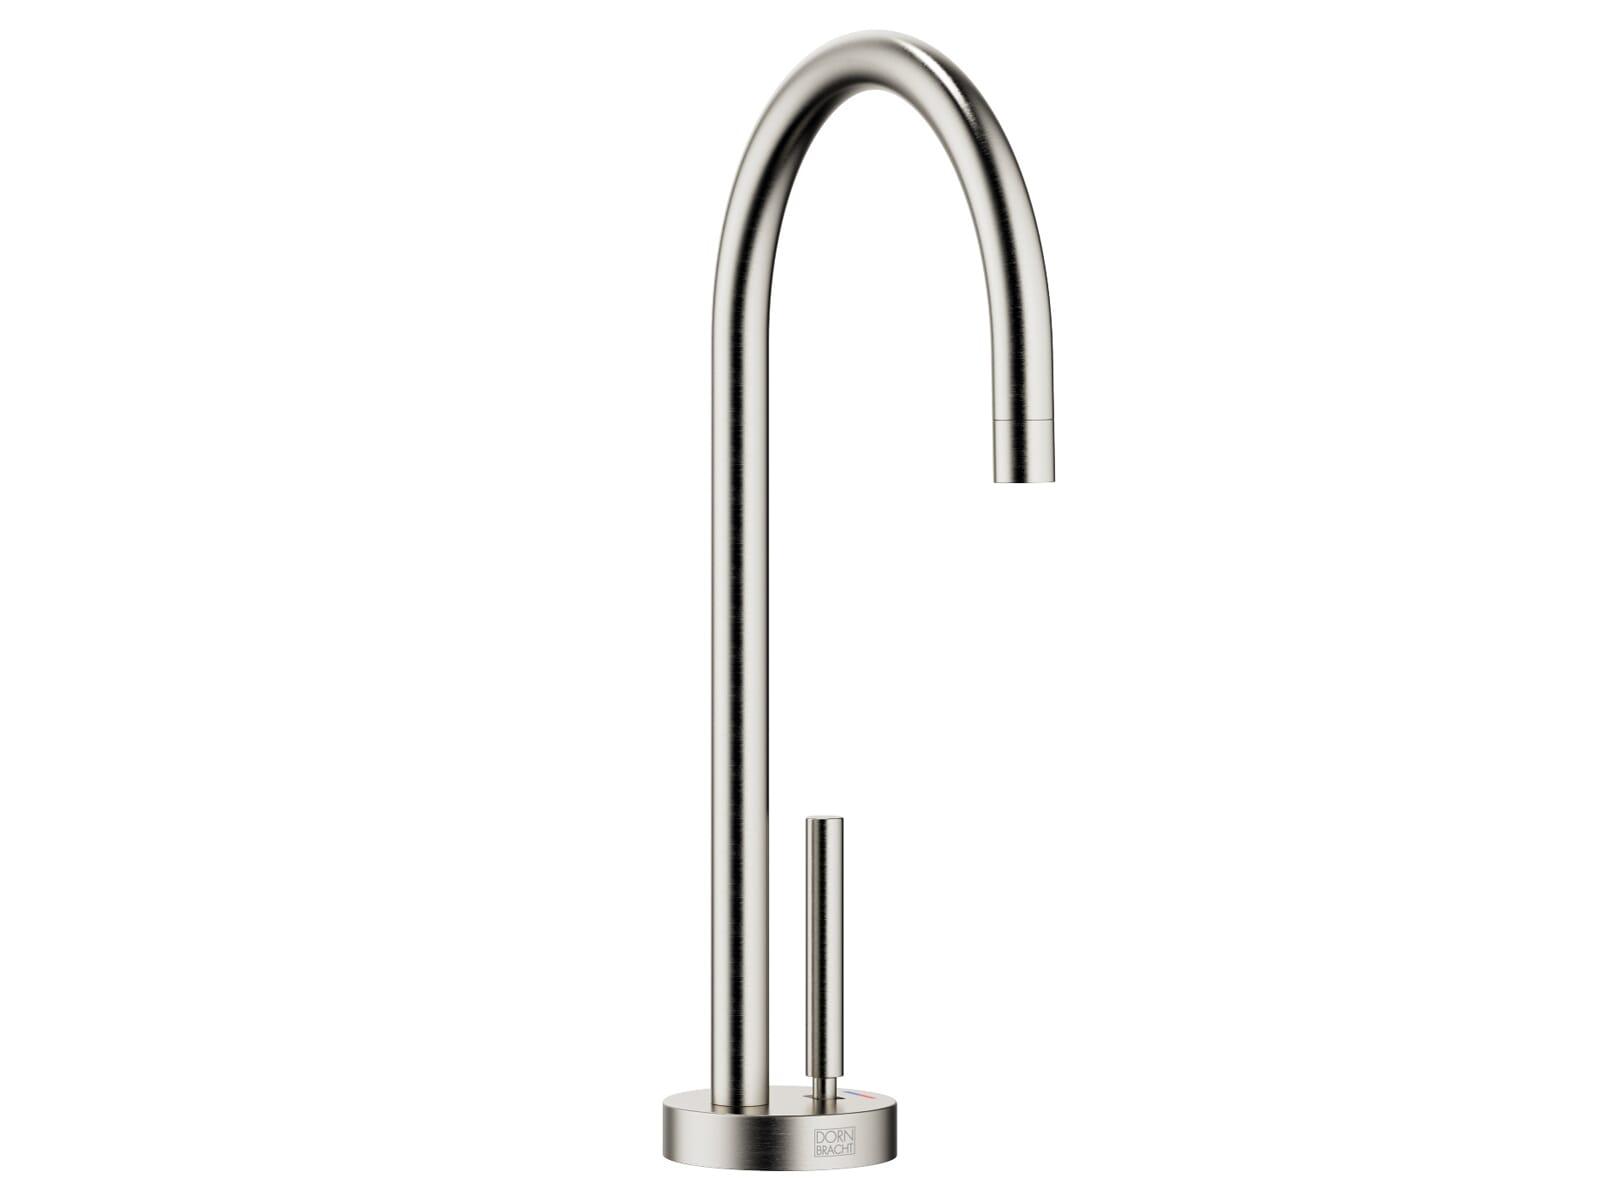 Dornbracht Tara Classic Hot & Cold Water Dispenser Platin Matt 17 861 888-06 Hochdruckarmatur